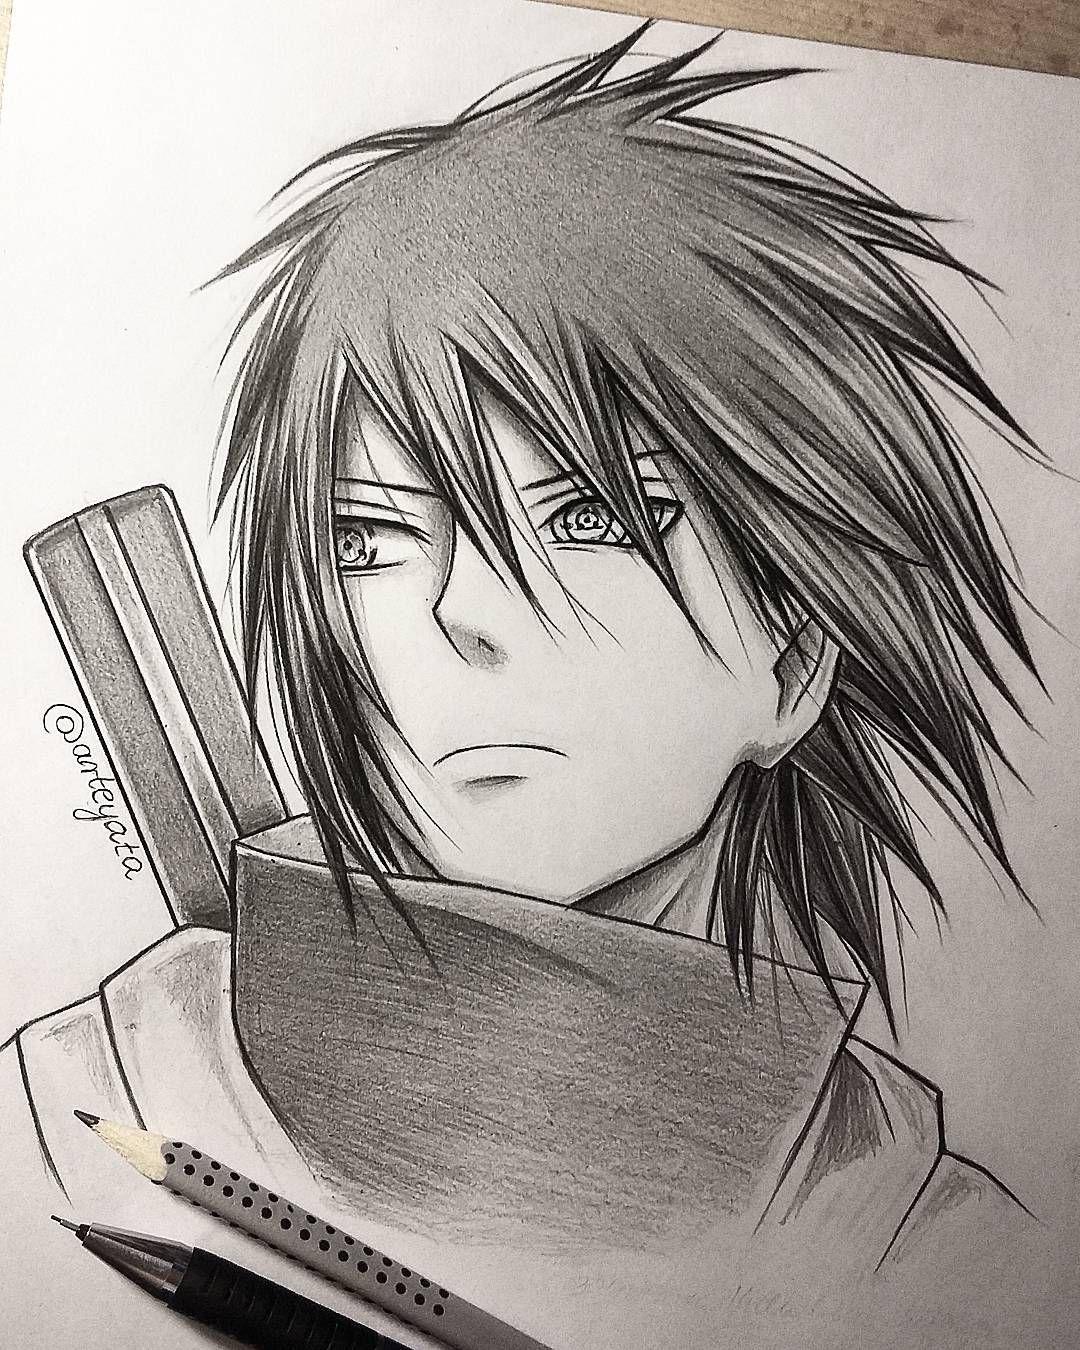 1080x1350 Pin By Ji On Art Naruto, Anime And Sasuke